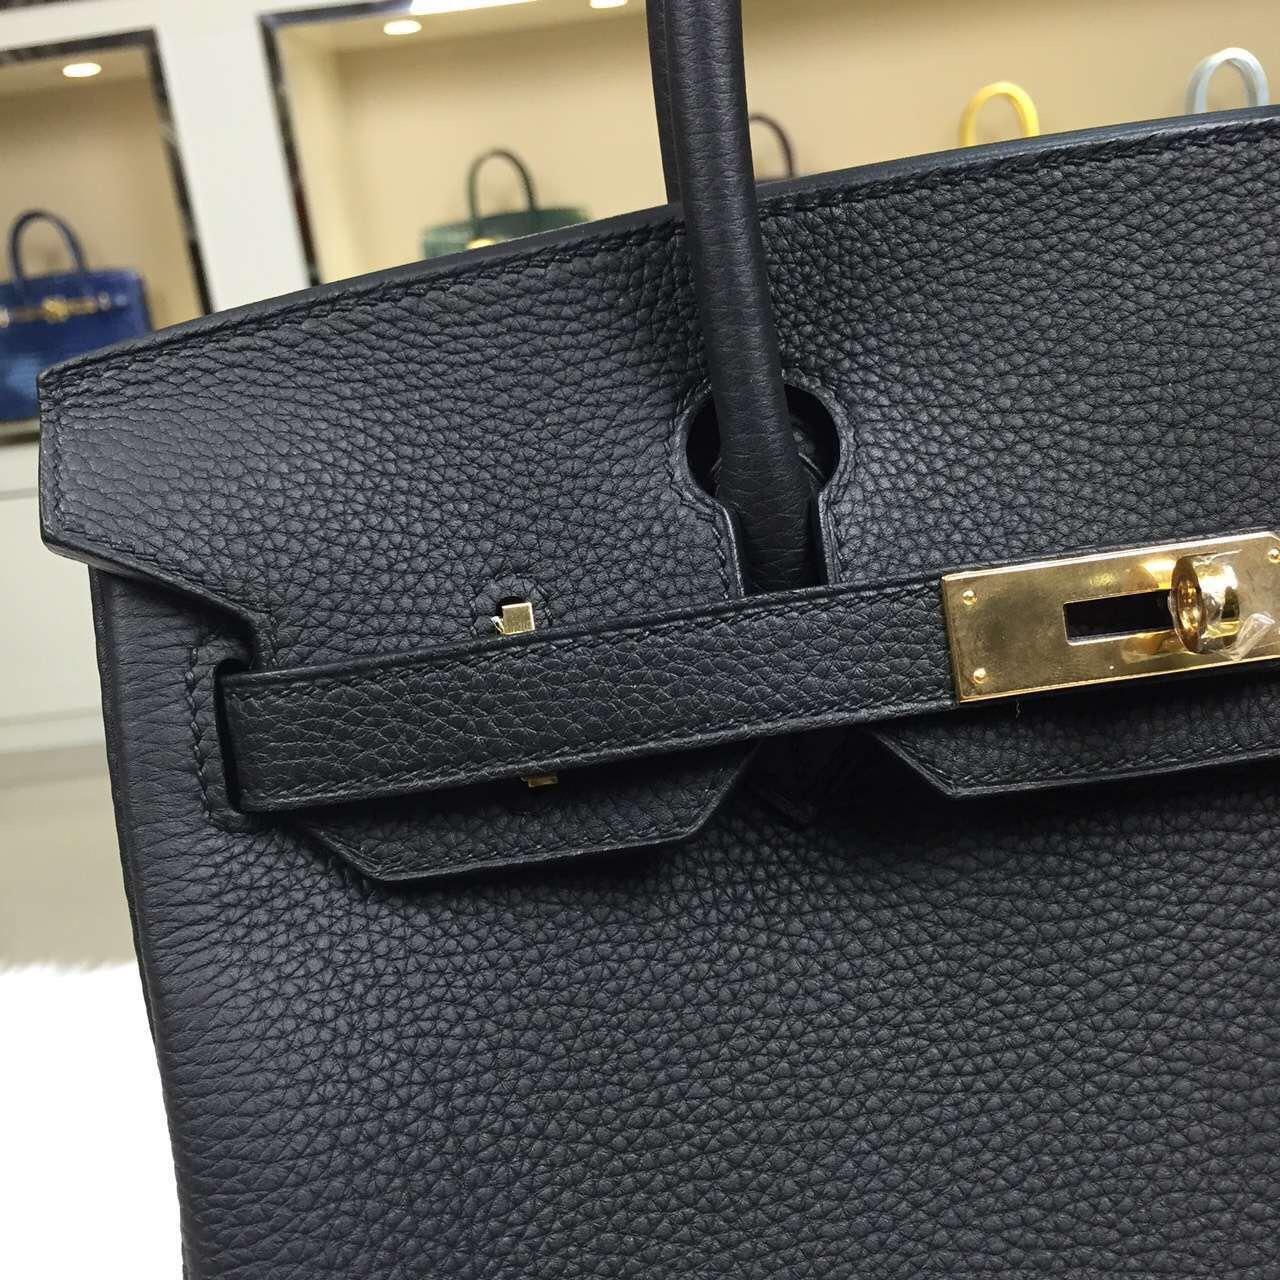 Luxury Hermes Birkin 30CM Black France Togo Leather Ladies' Tote Handbag